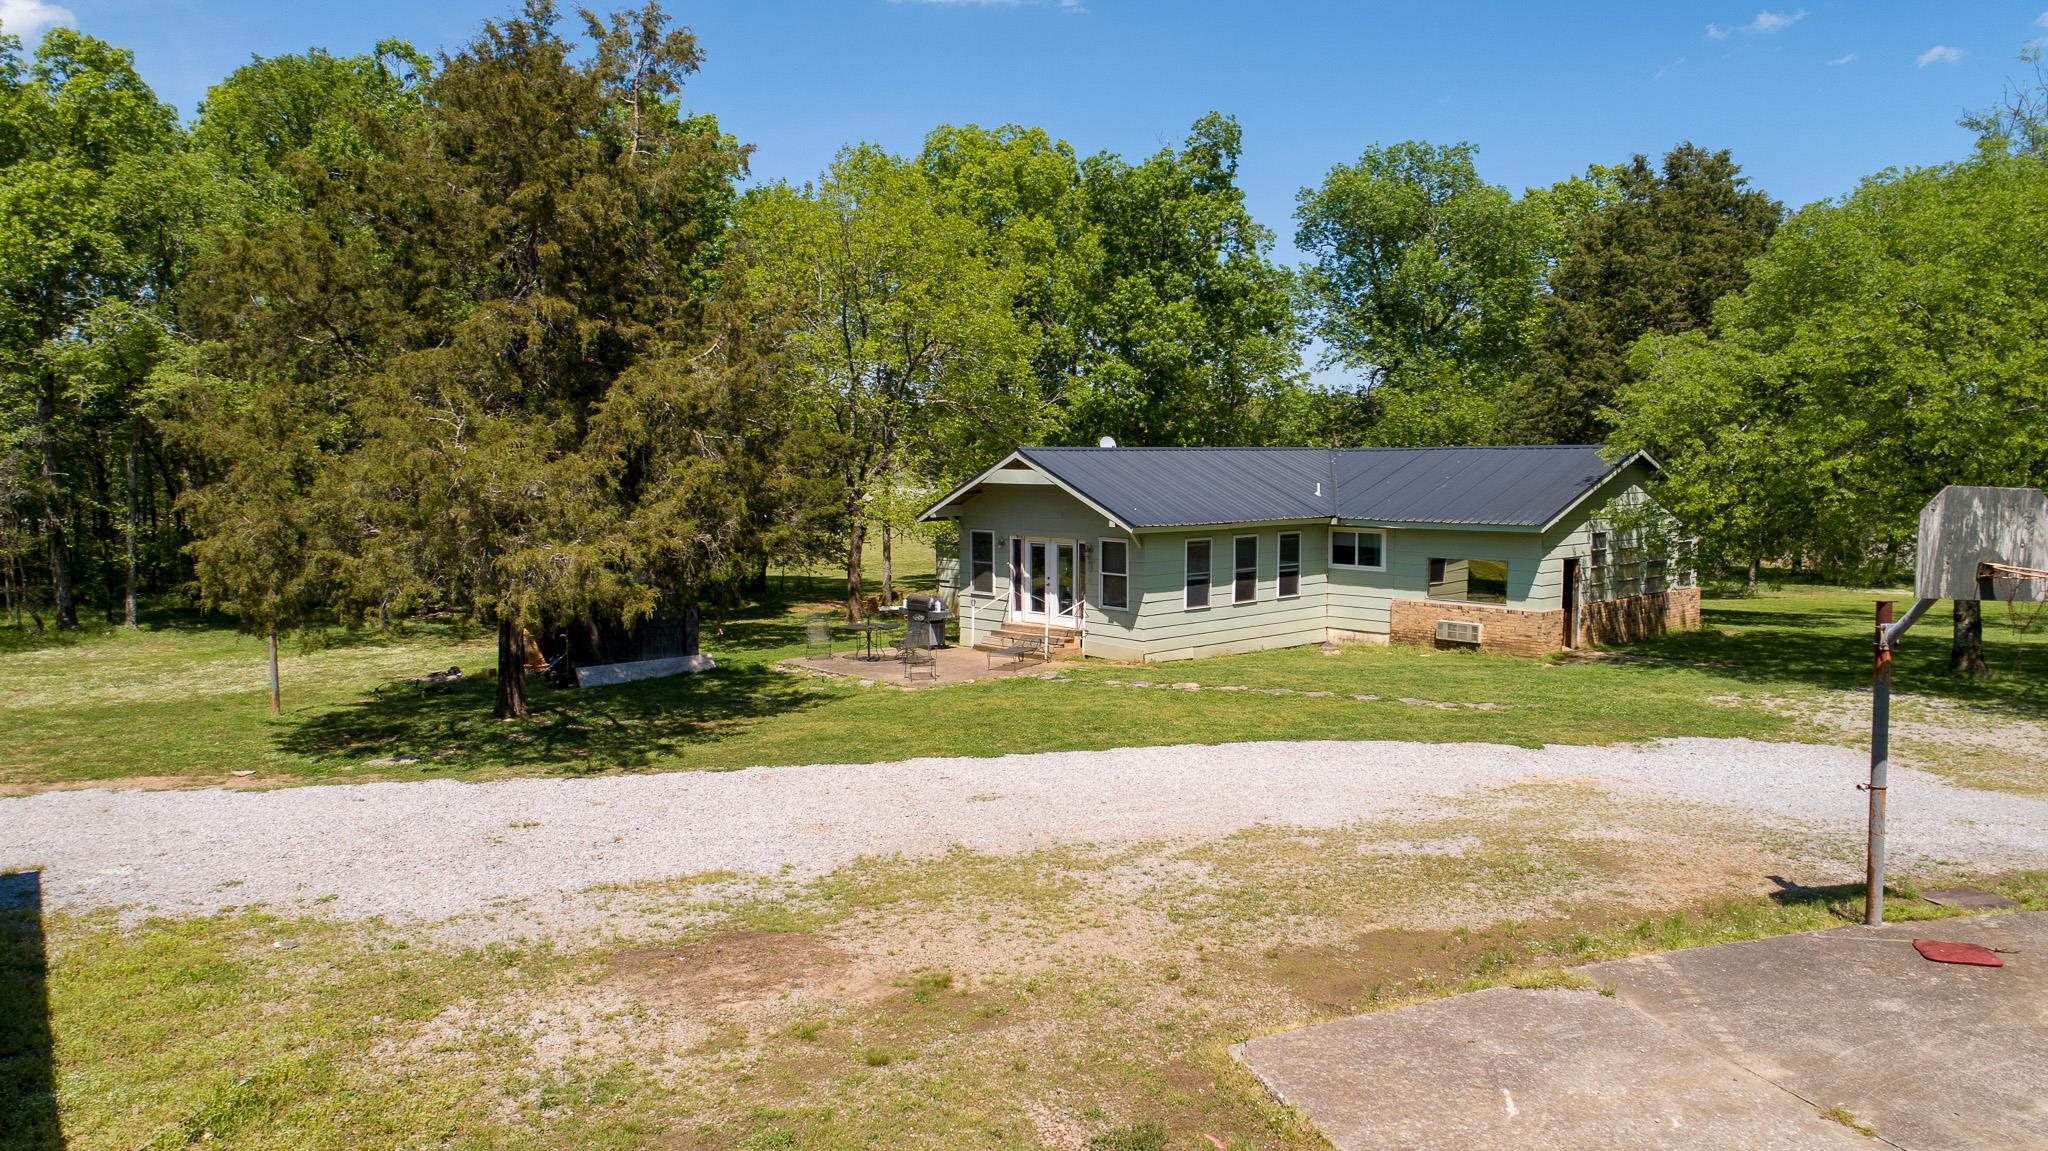 $1,450,000 - 3Br/2Ba -  for Sale in N/a, Murfreesboro